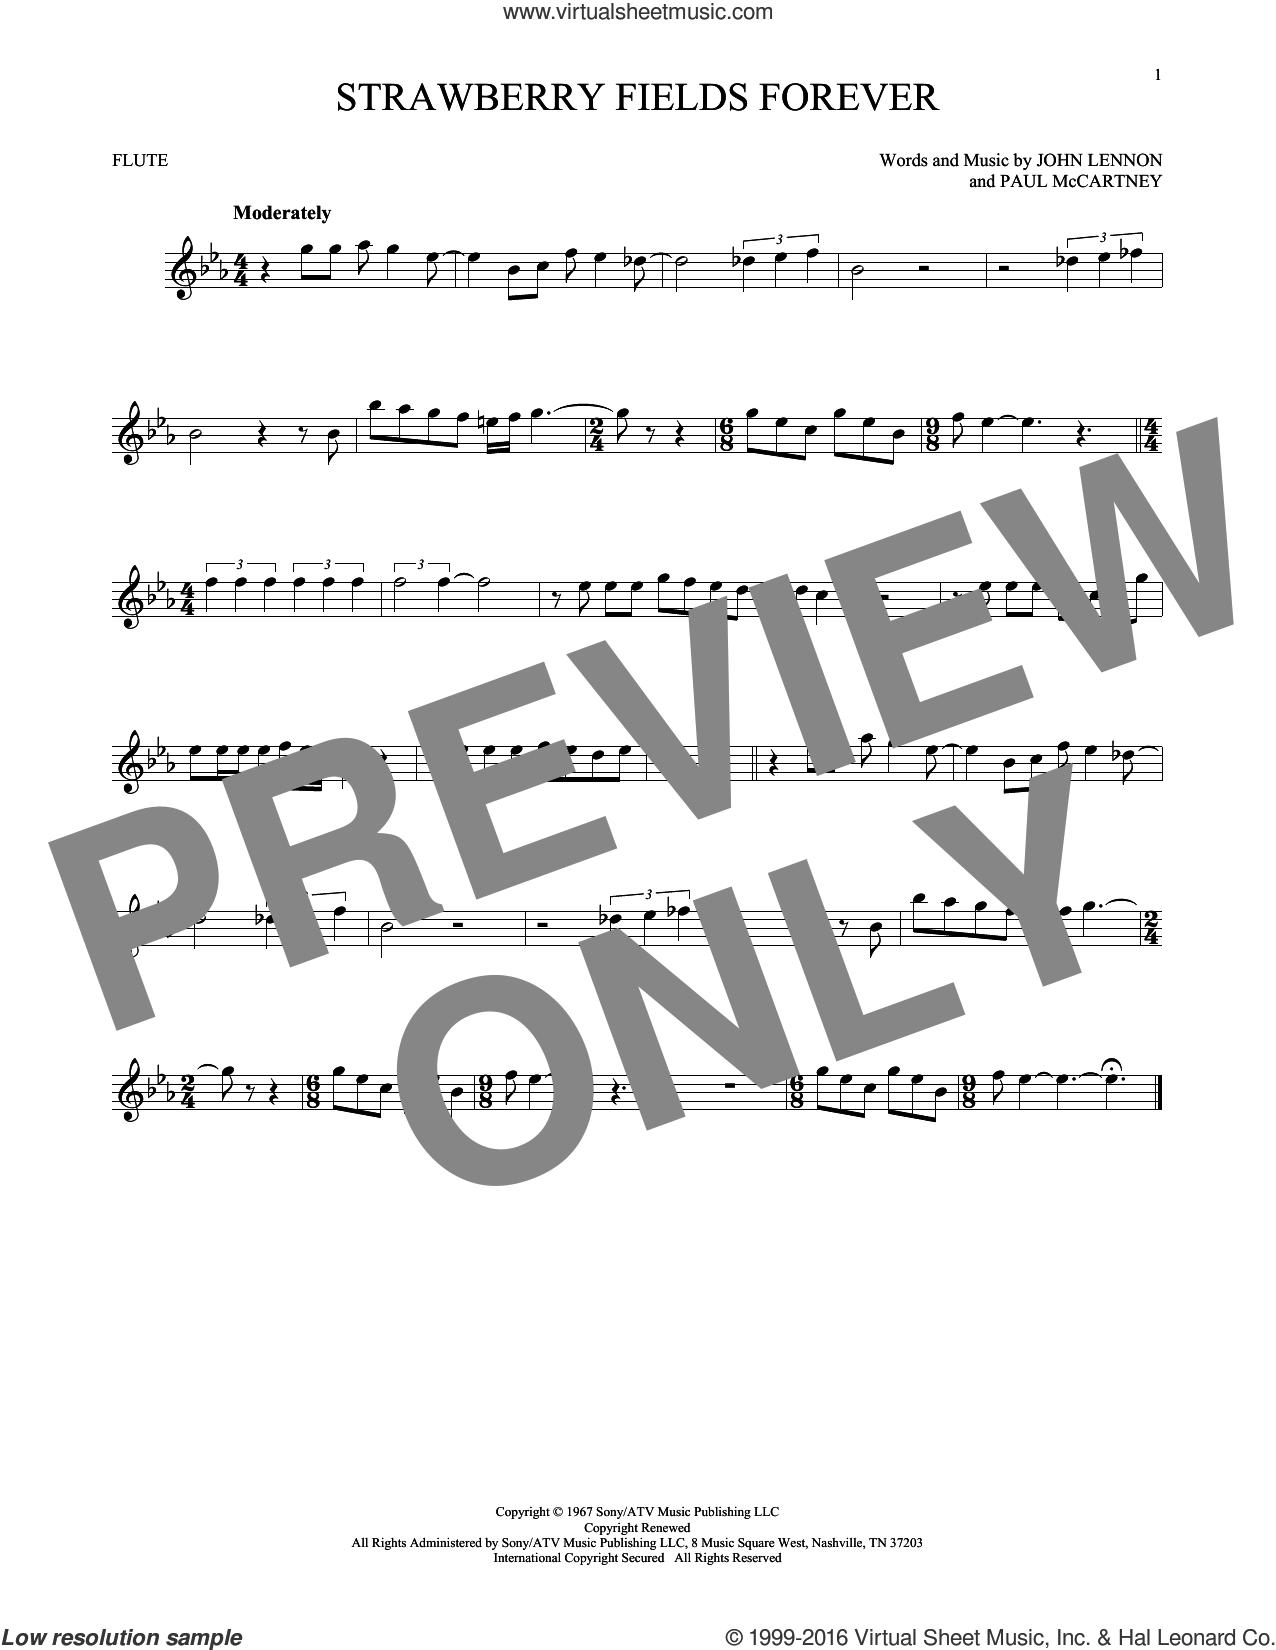 Strawberry Fields Forever sheet music for flute solo by The Beatles, John Lennon and Paul McCartney, intermediate skill level